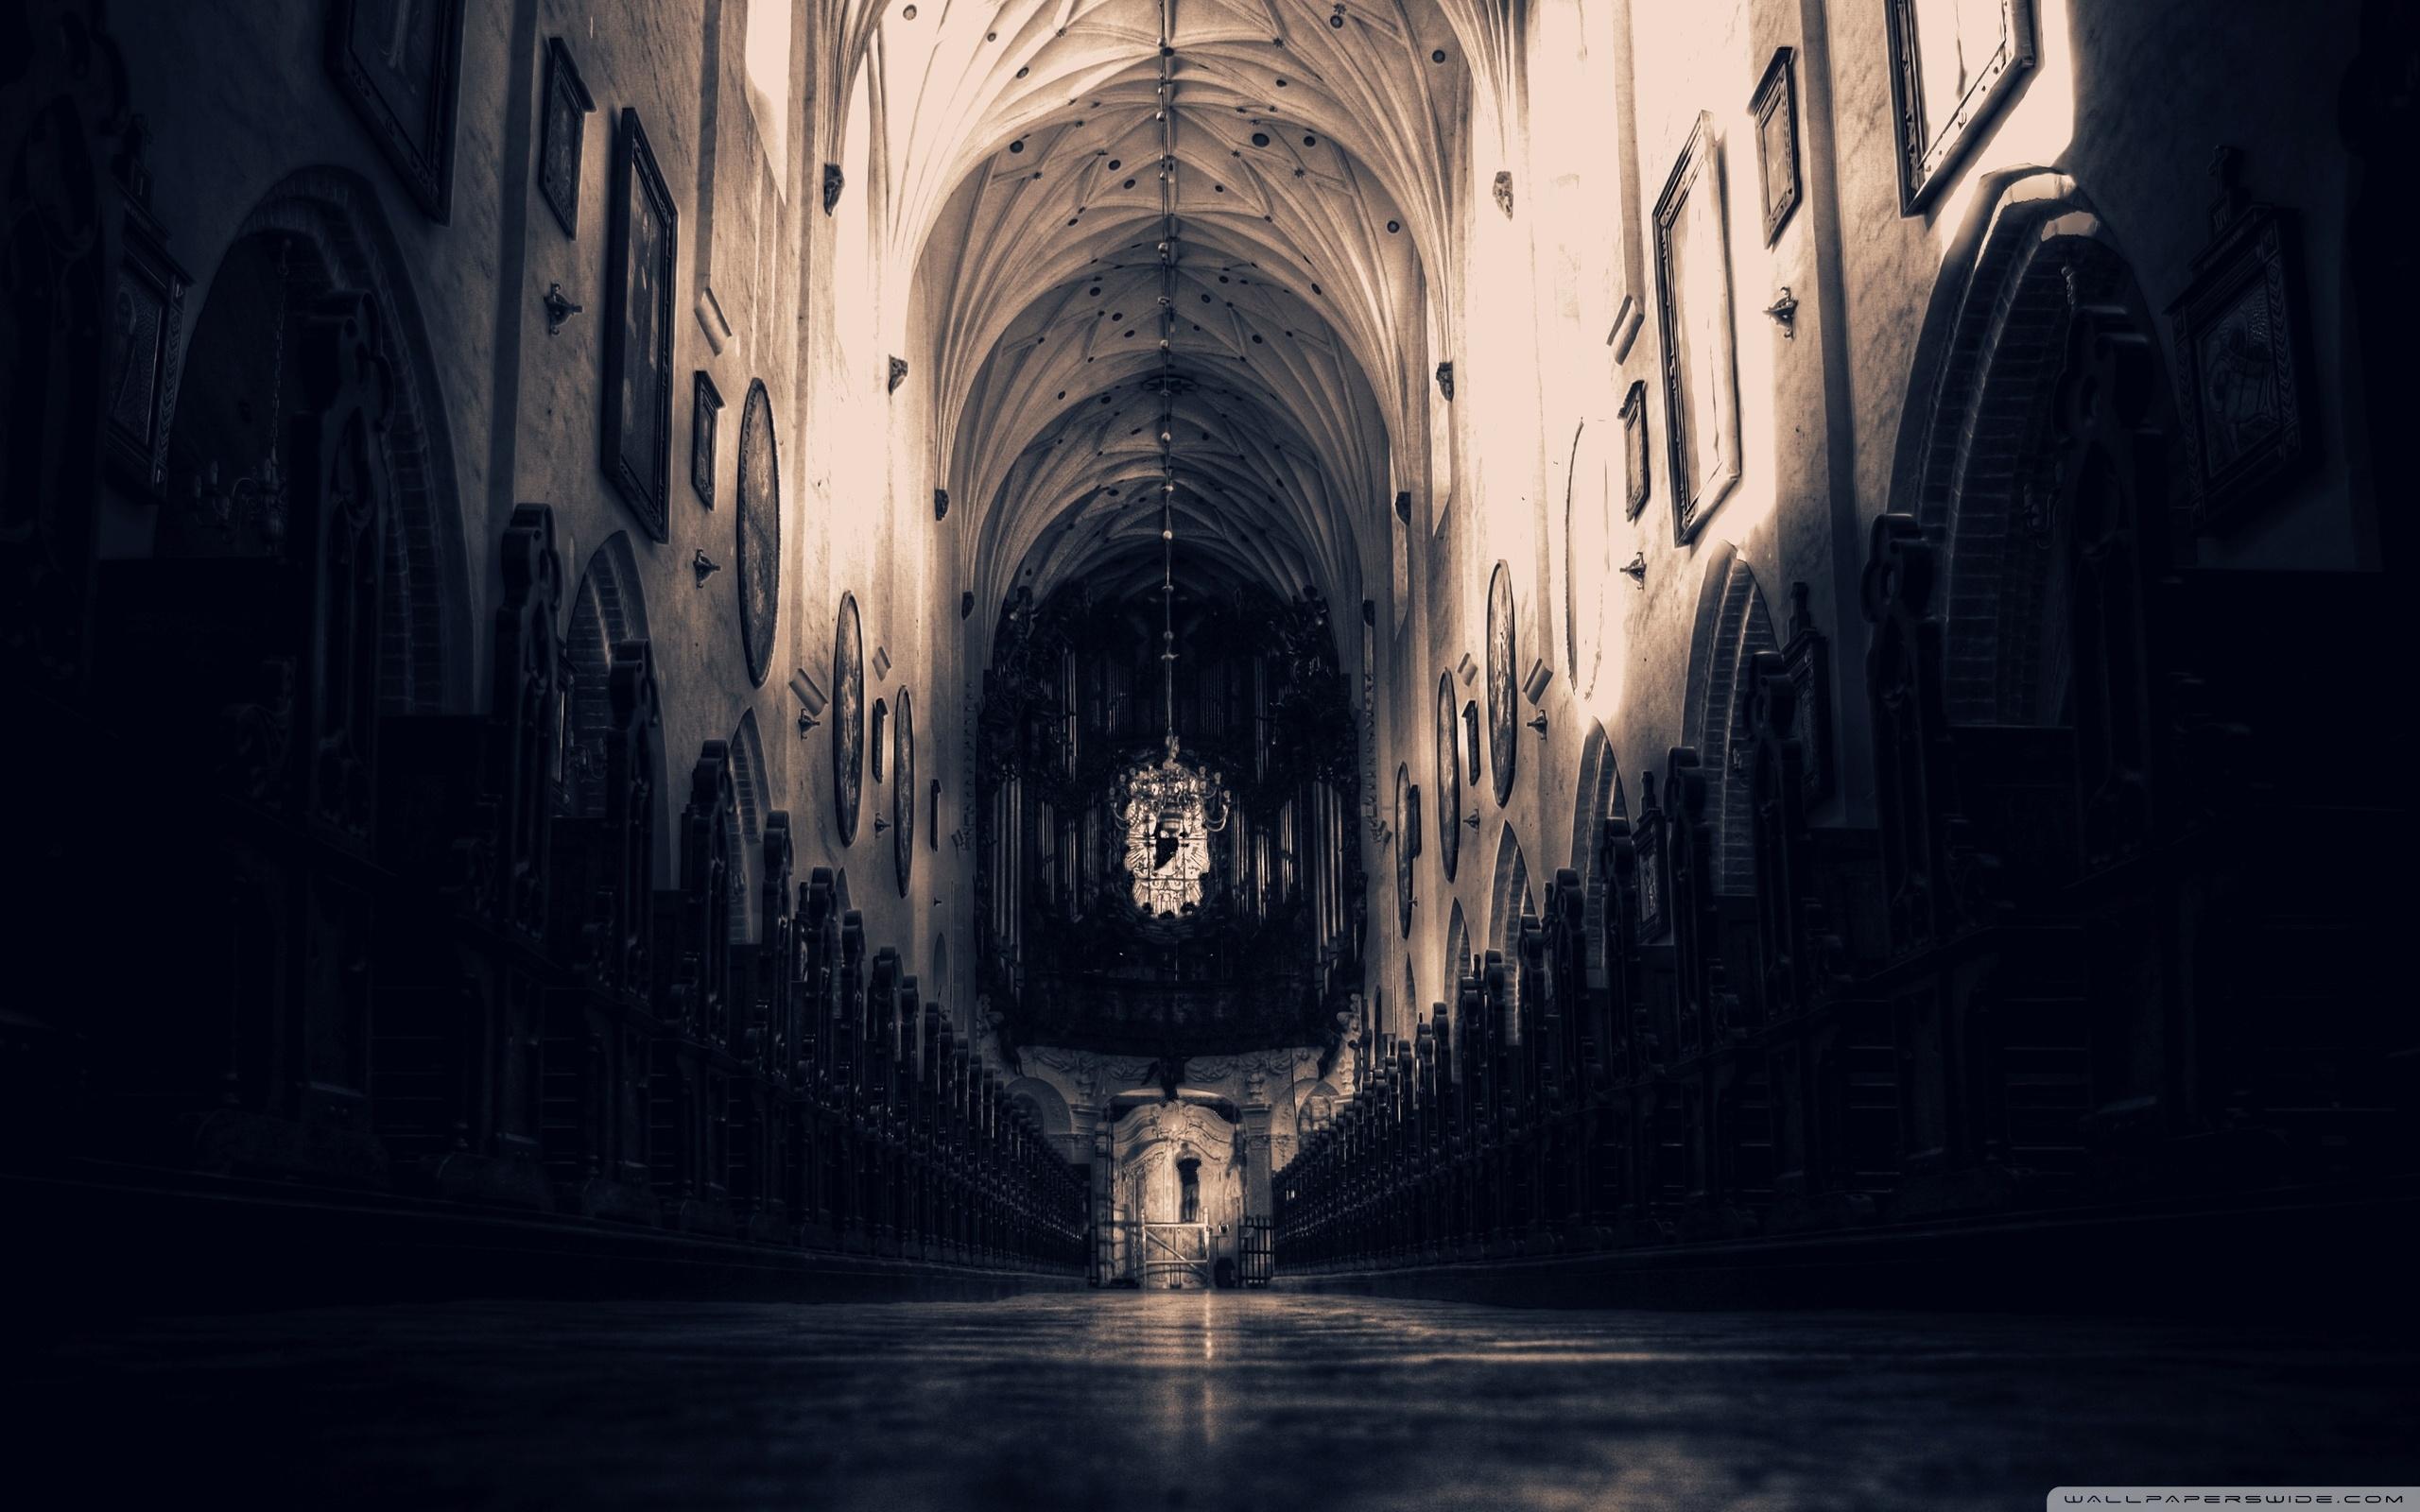 Gothic Architecture HD desktop wallpaper : High Definition